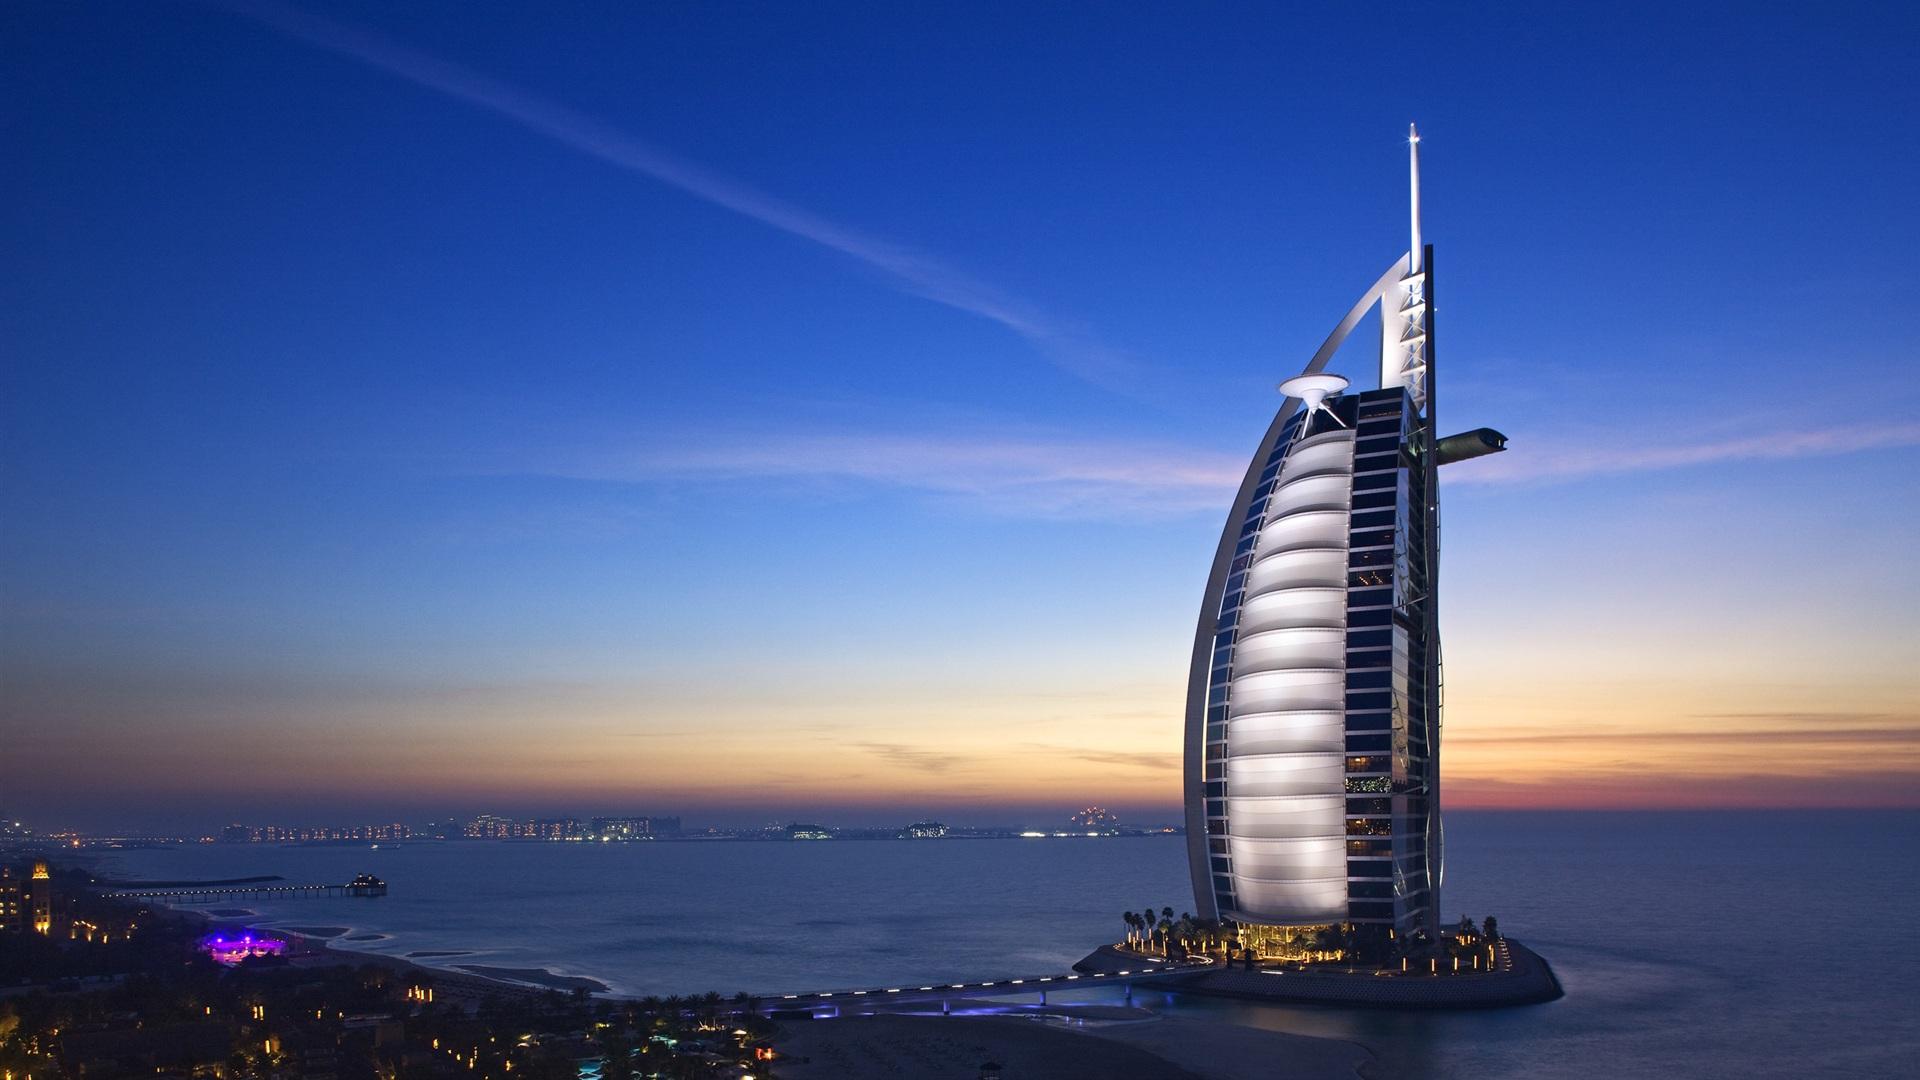 Download Wallpaper 1920x1080 Dubai Hotels Burj Al Arab